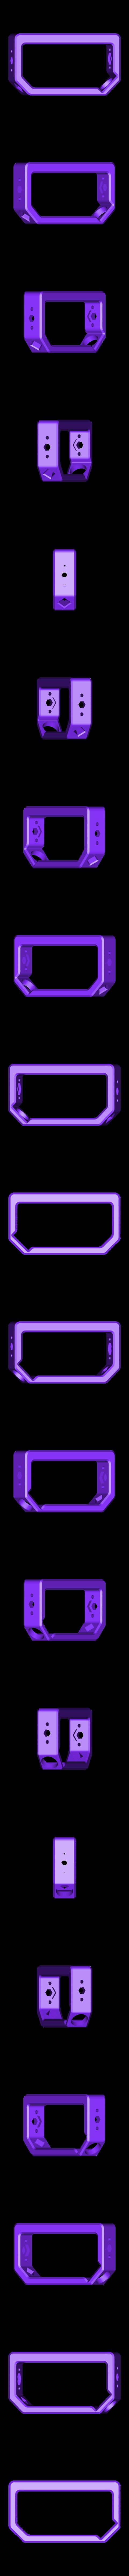 handle.stl Download free STL file Beastgrip Remix MK3 • 3D printable template, Kajdalon